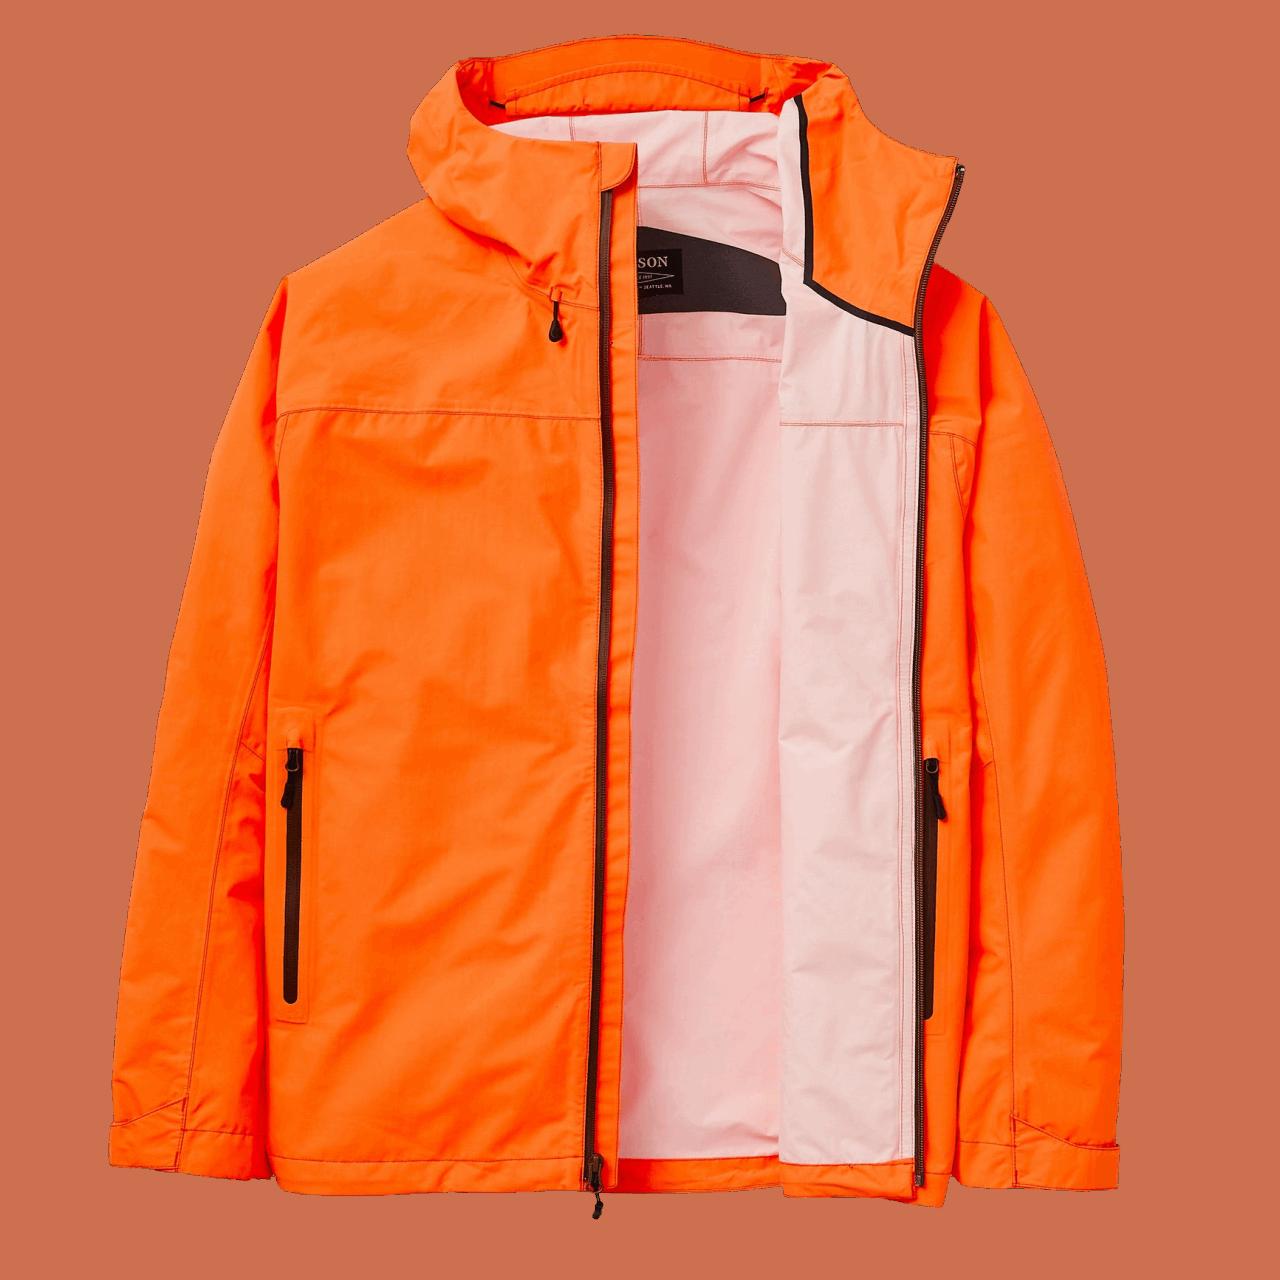 Filson Swiftwater Rain Jacket - blaze orange